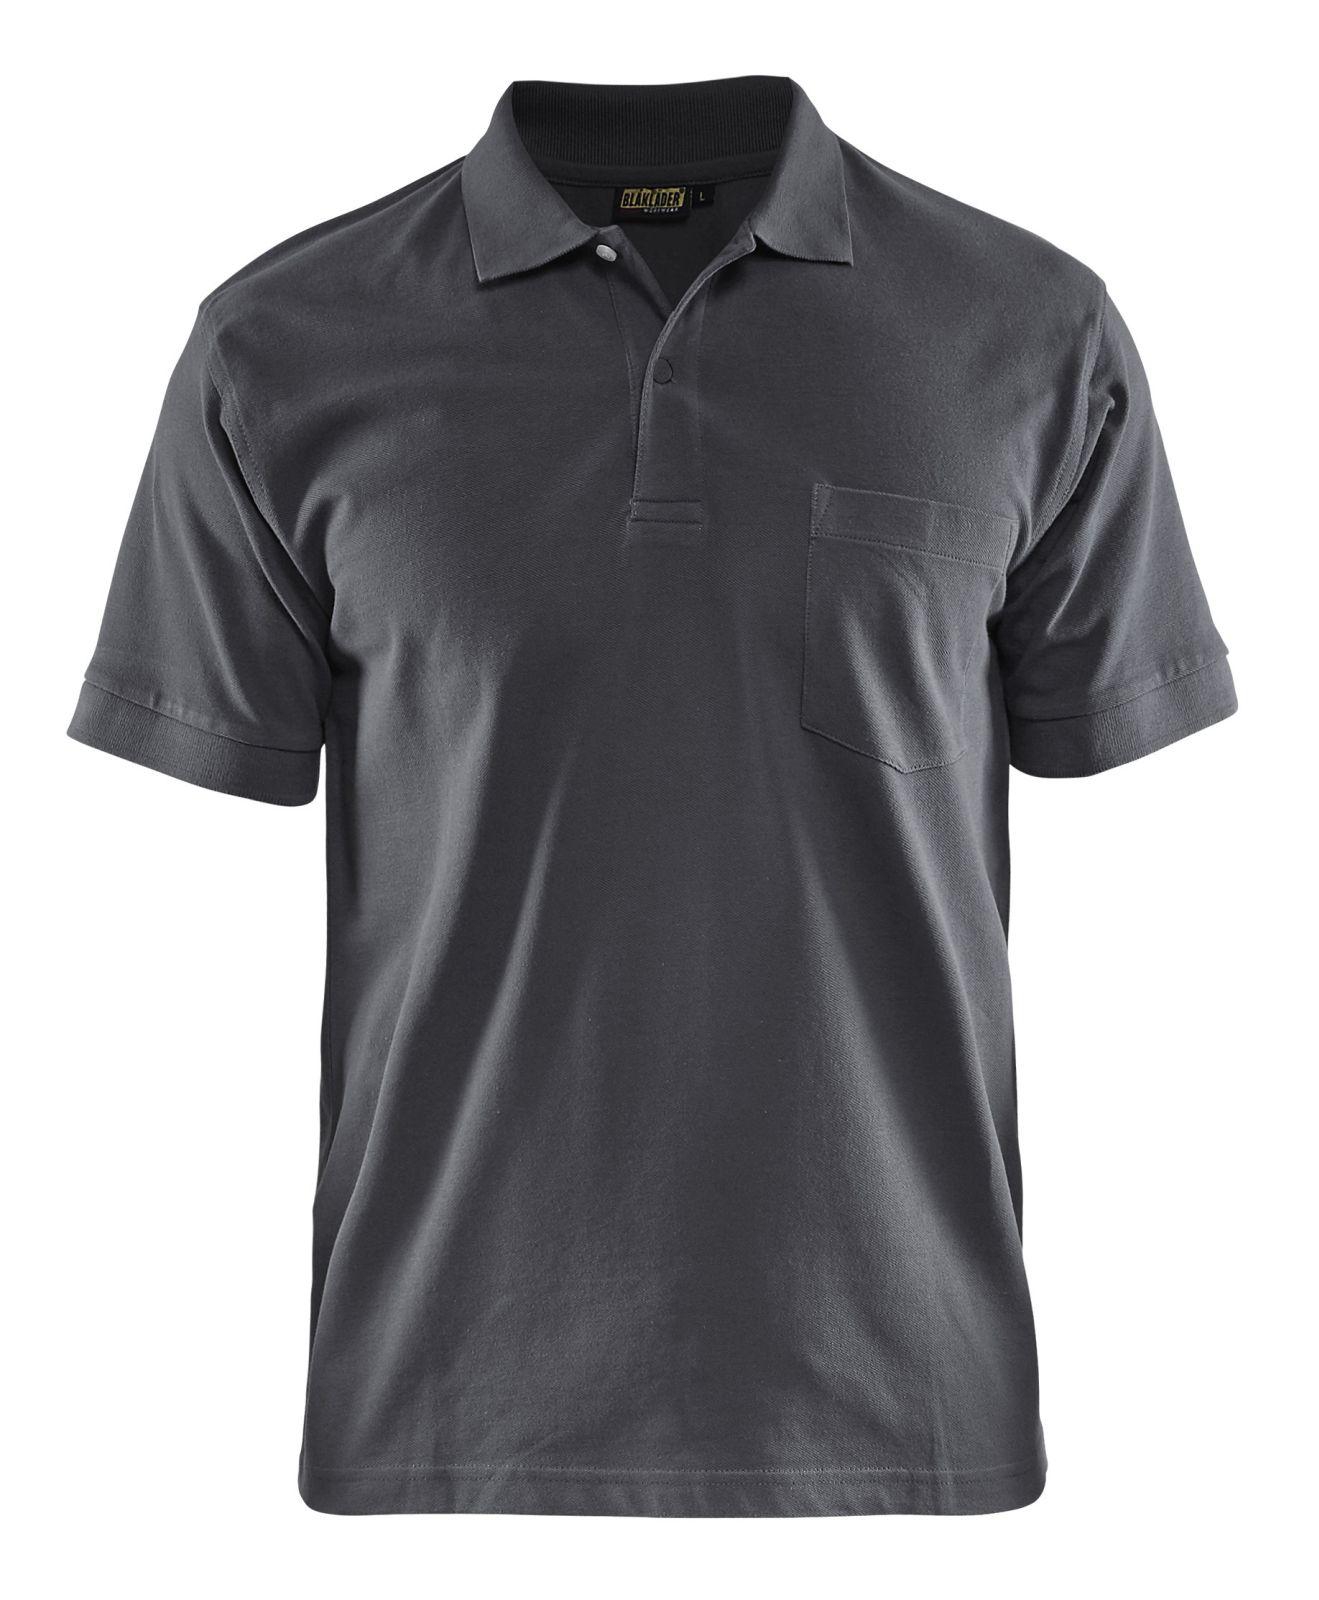 Blaklader Polo shirts 33051035 donkergrijs(9800)